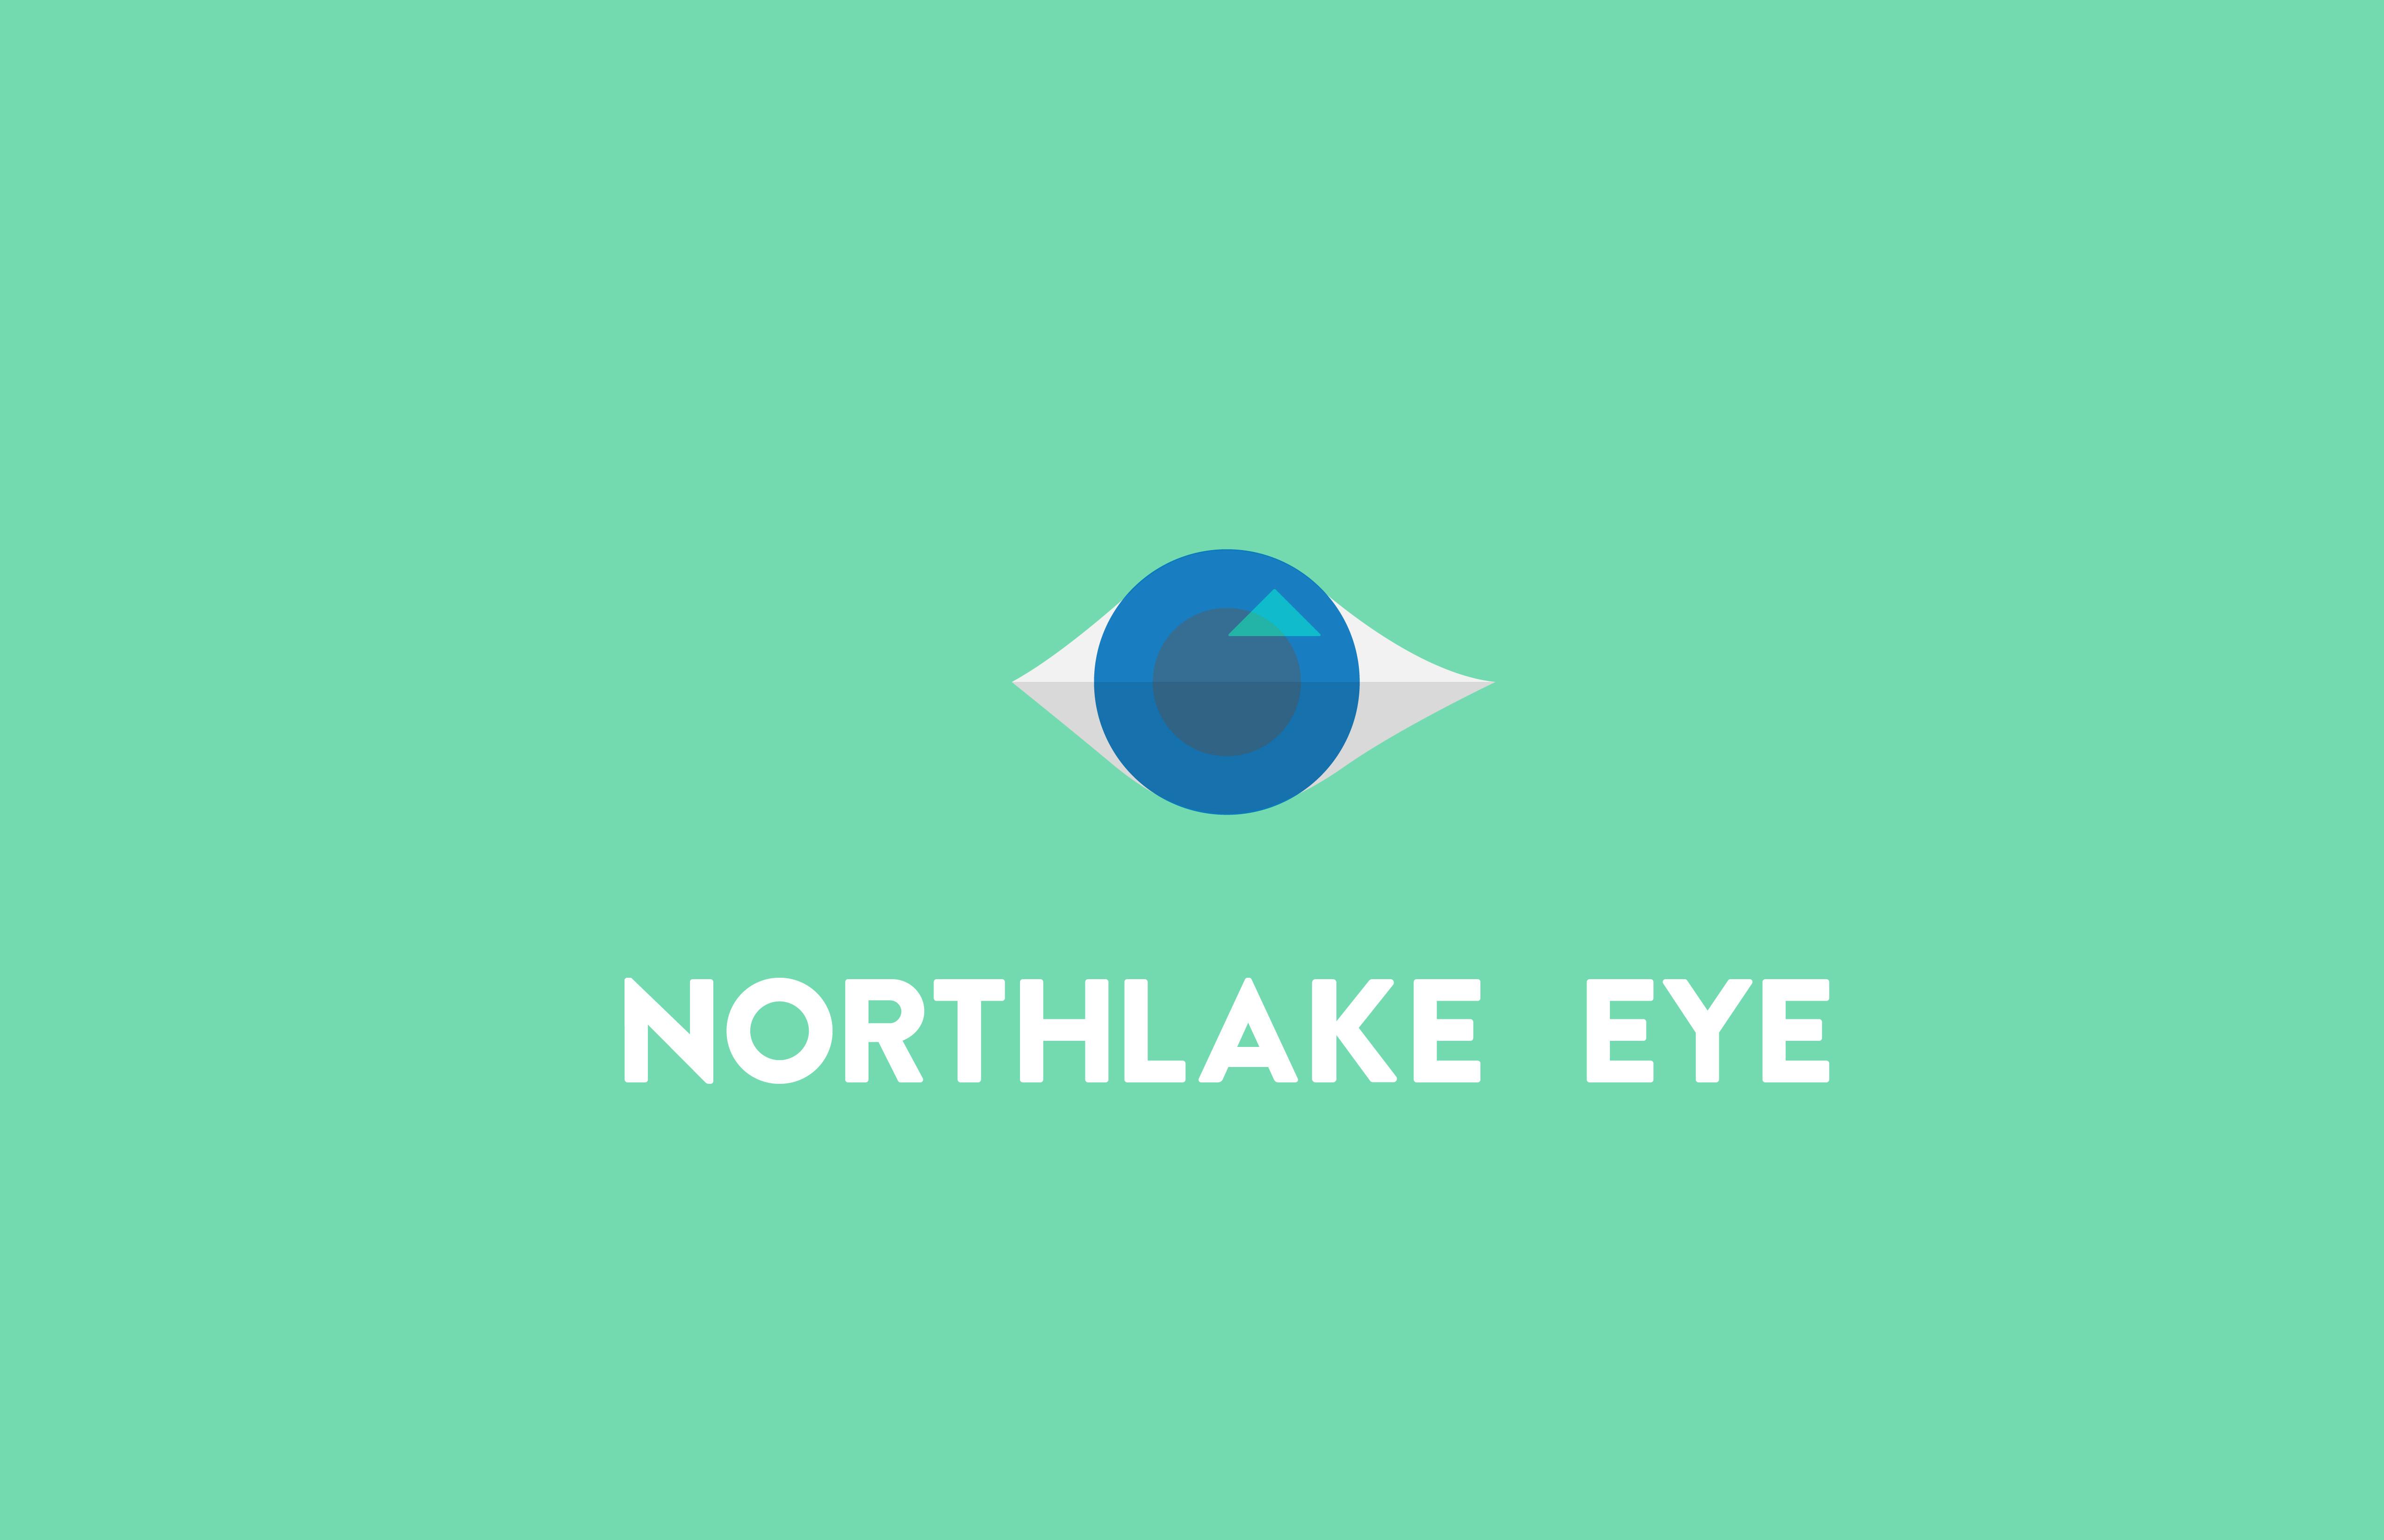 Northlake Eye